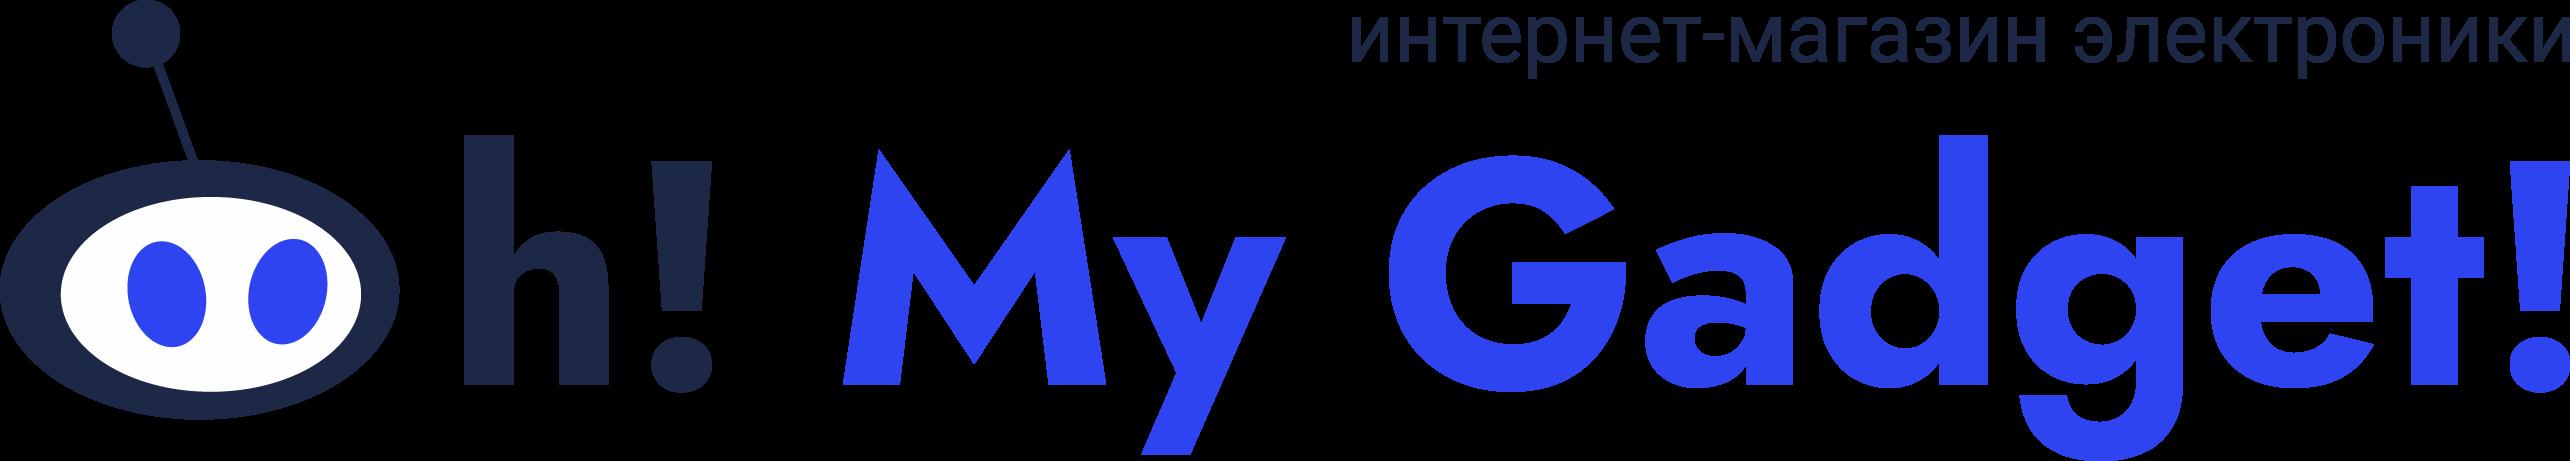 Интернет магазин Ohmygadget54.ru